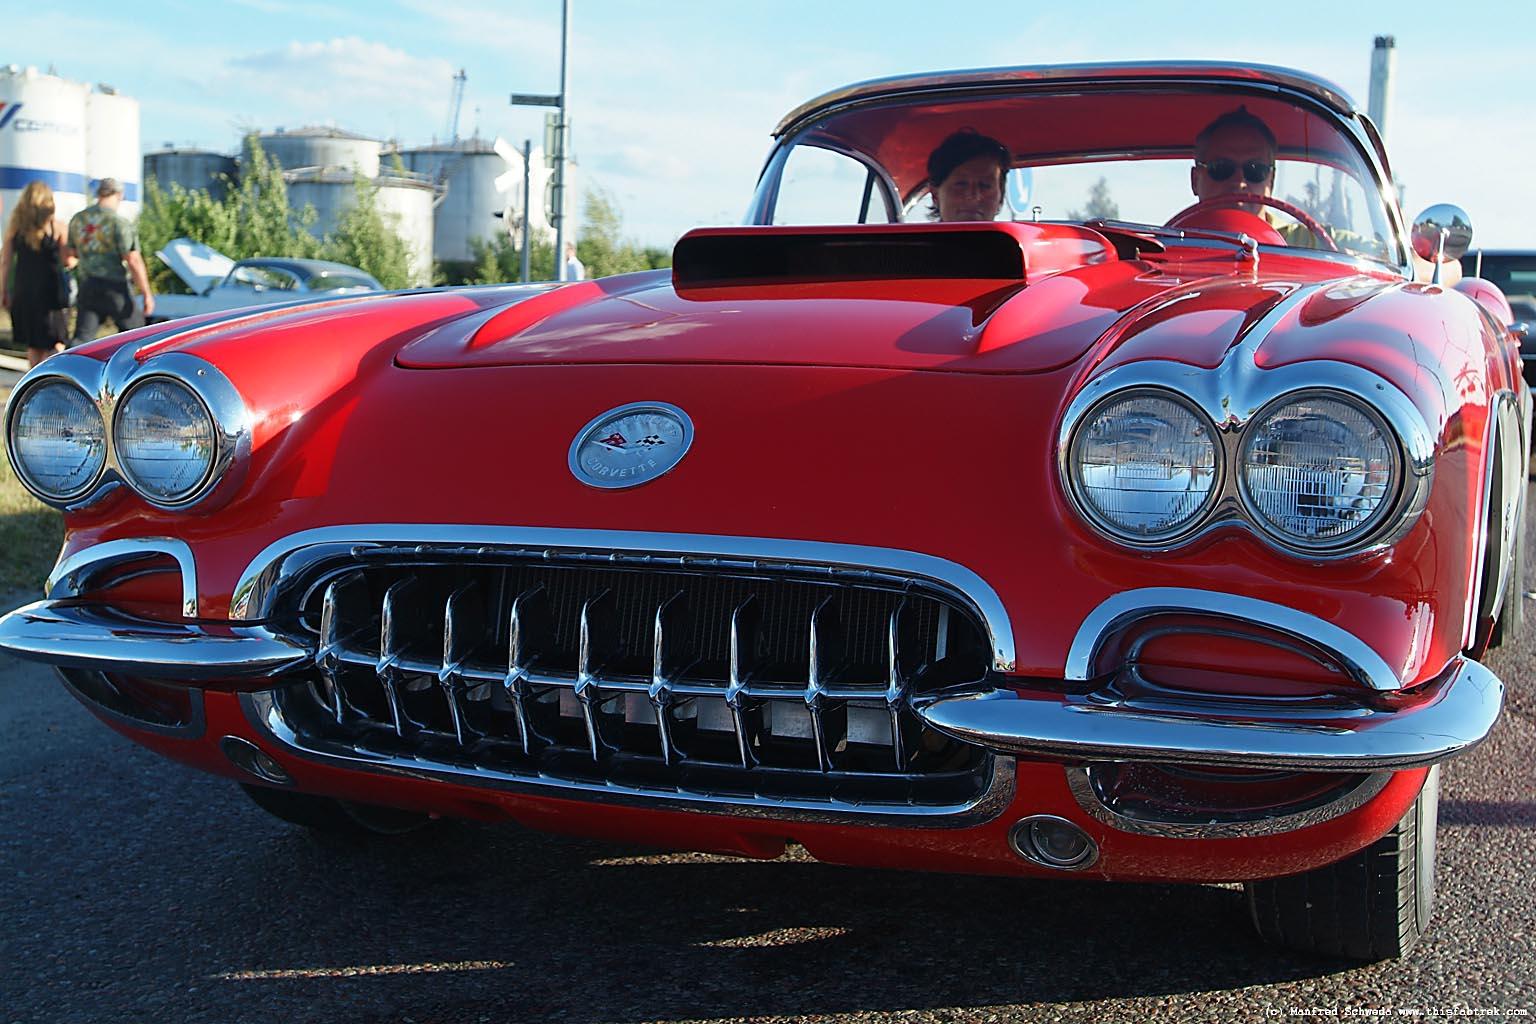 Red Corvette.